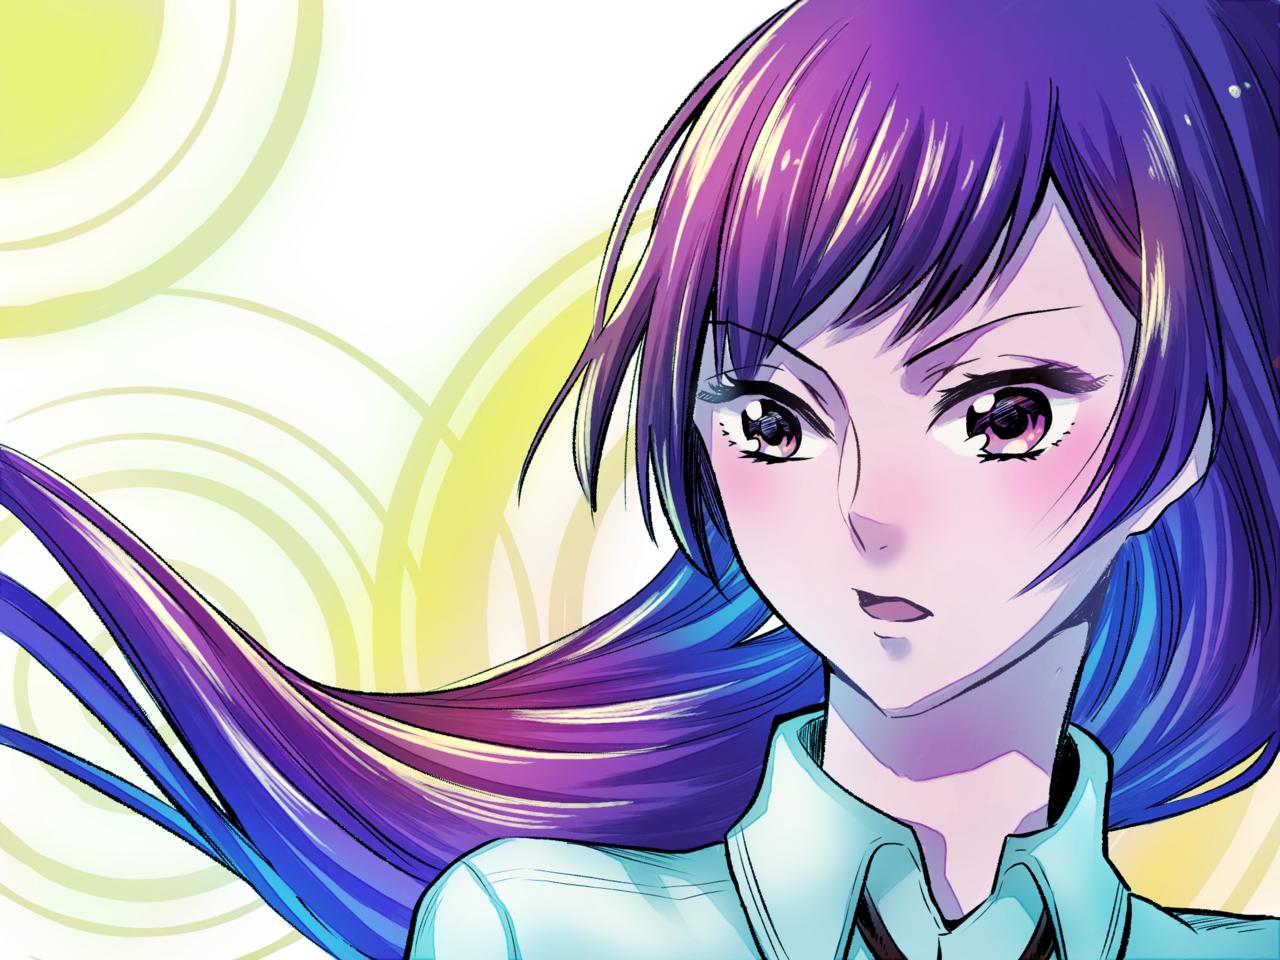 Illust of Kyomo